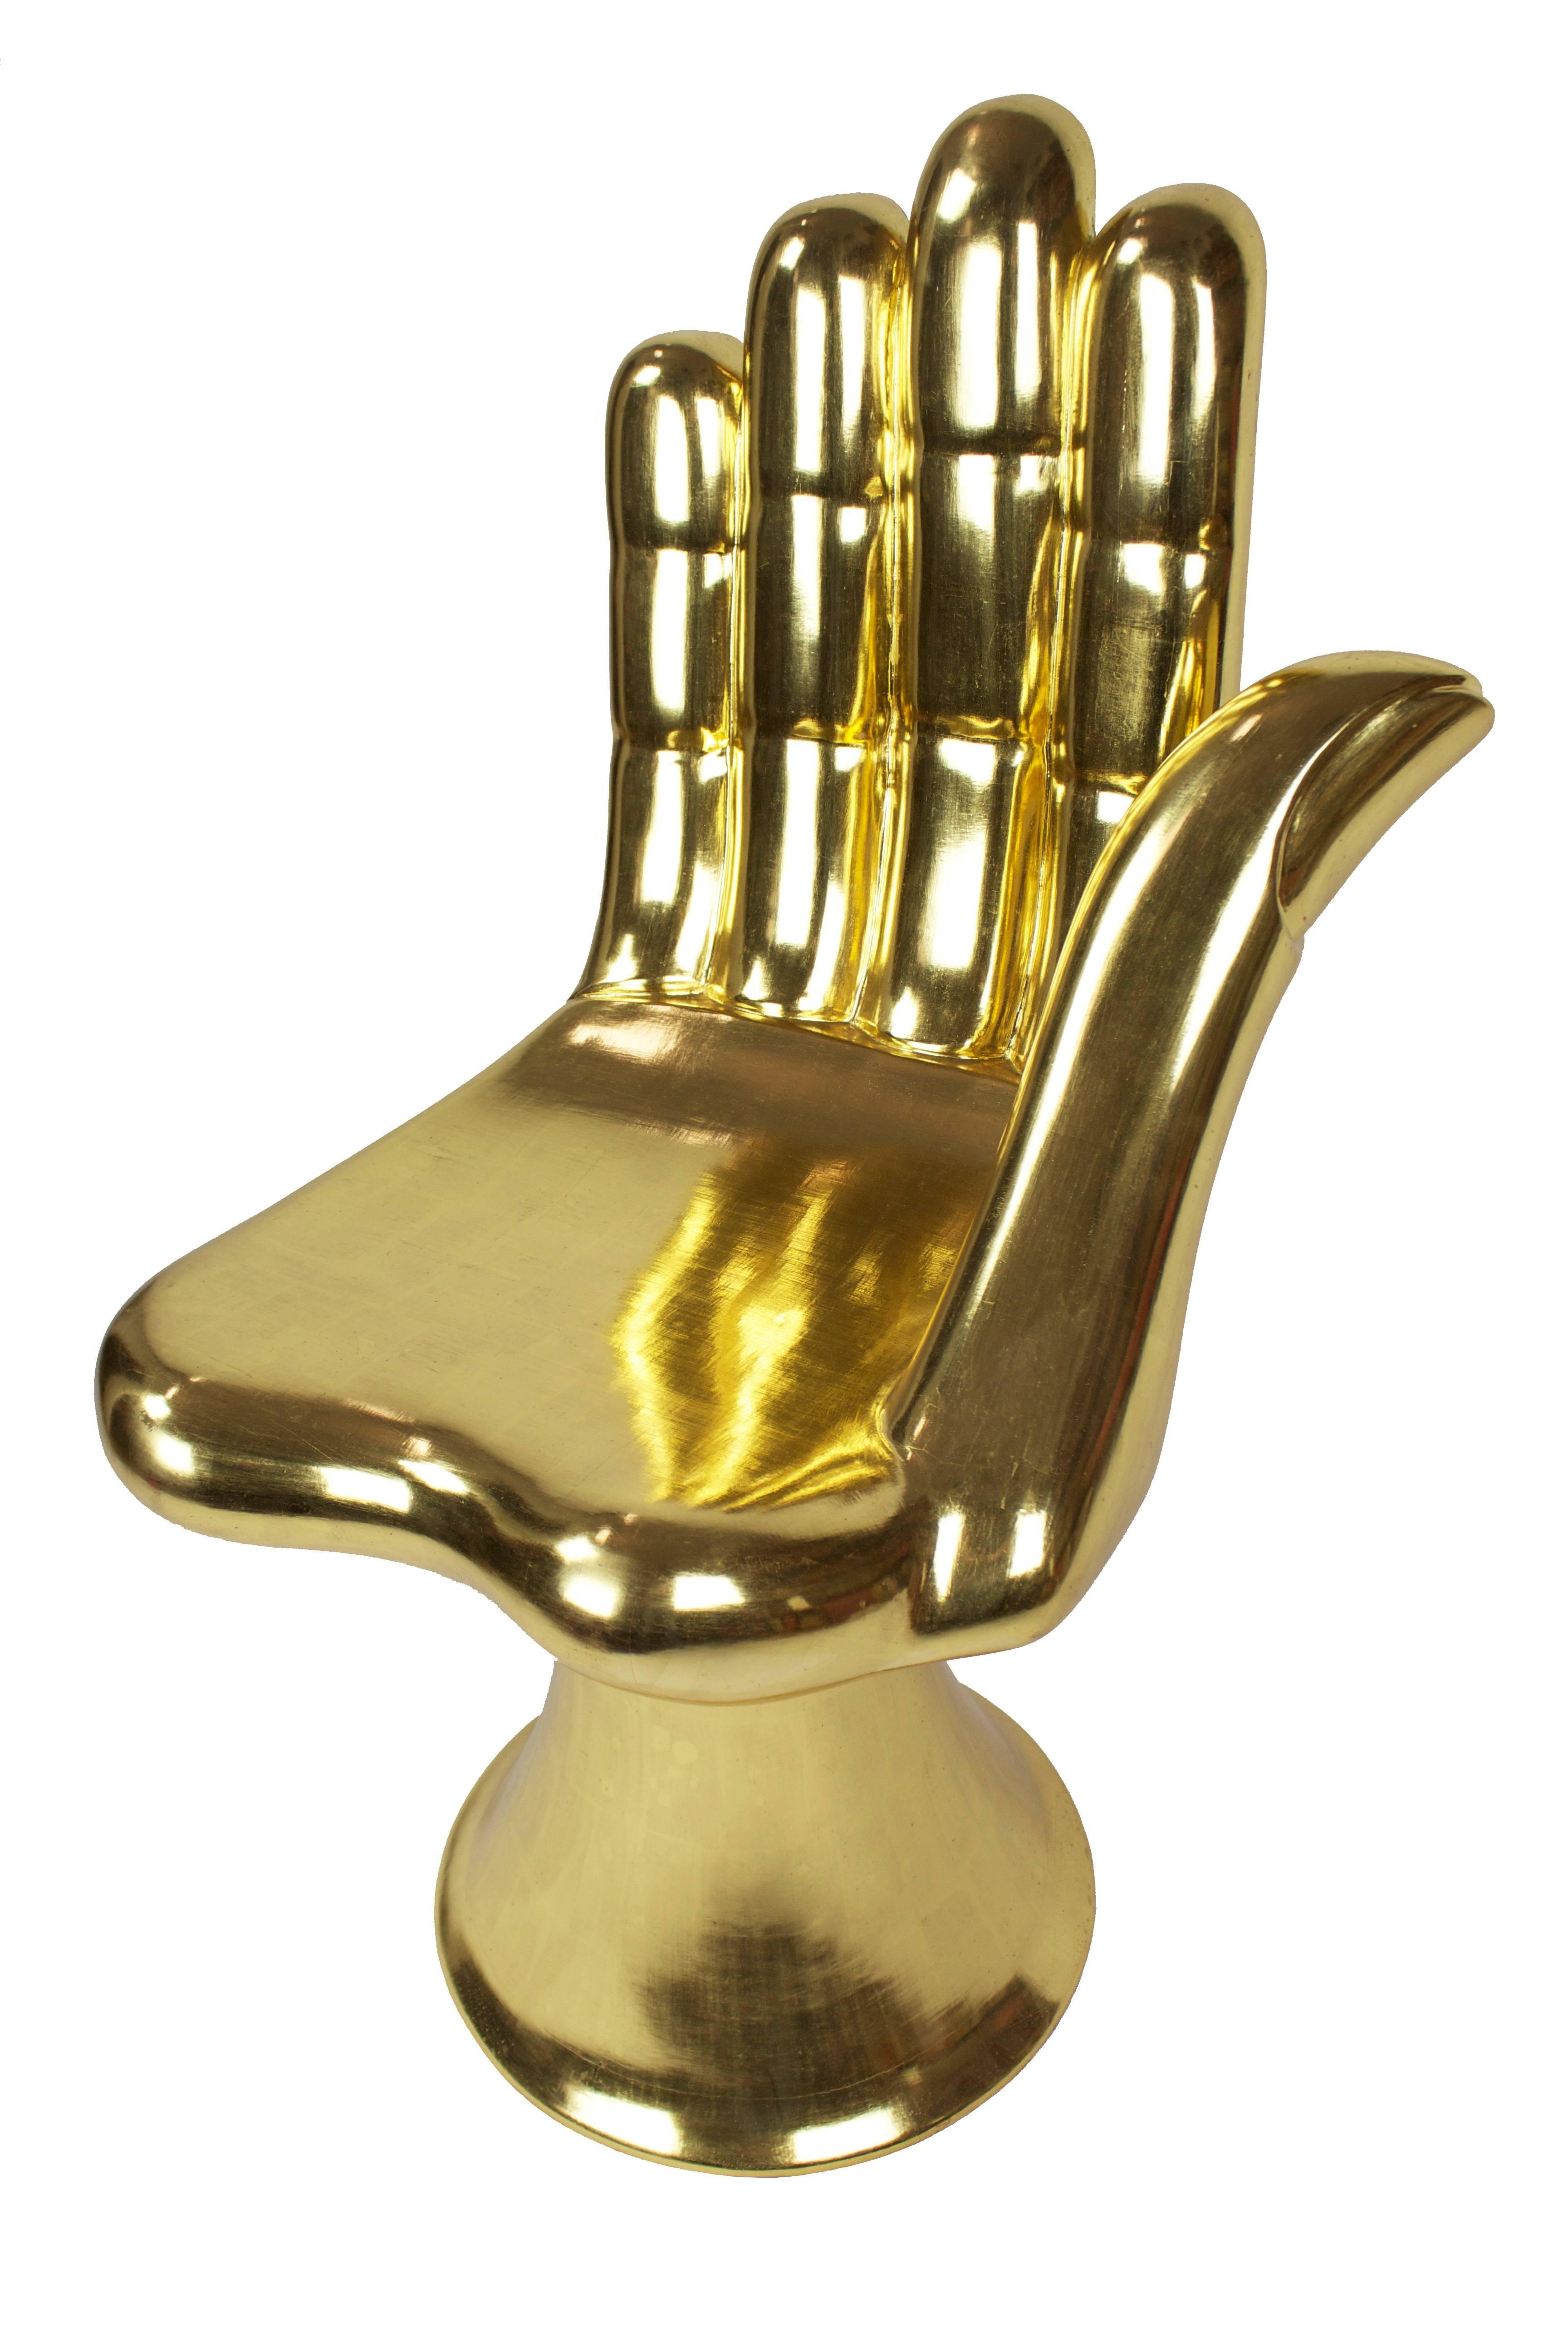 Pedro Friedeberg - Gold Hand Chair, Sculpture at 1stdibs